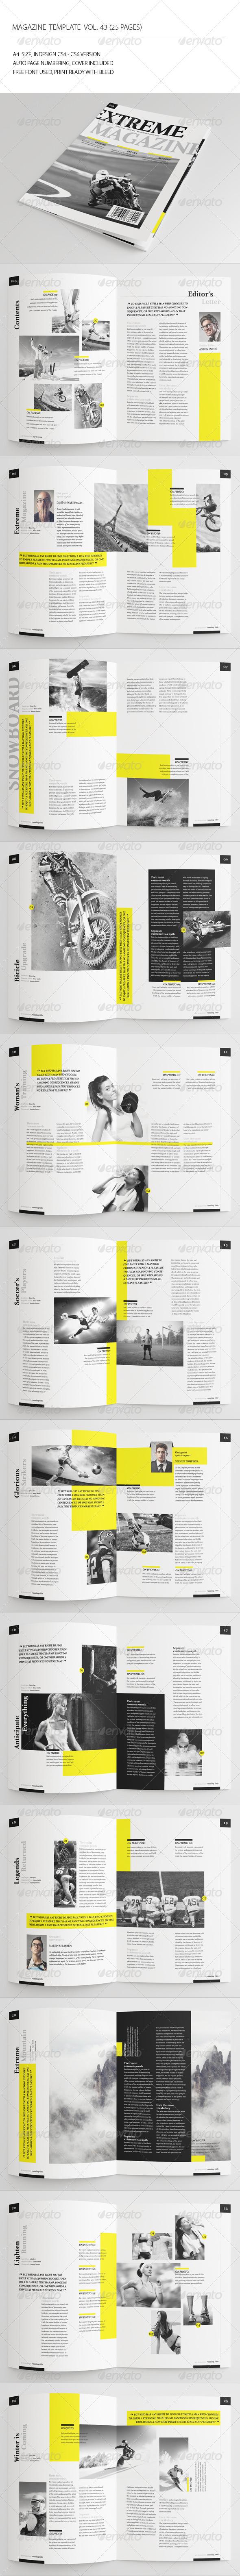 25 Pages Sport Magazine Vol43